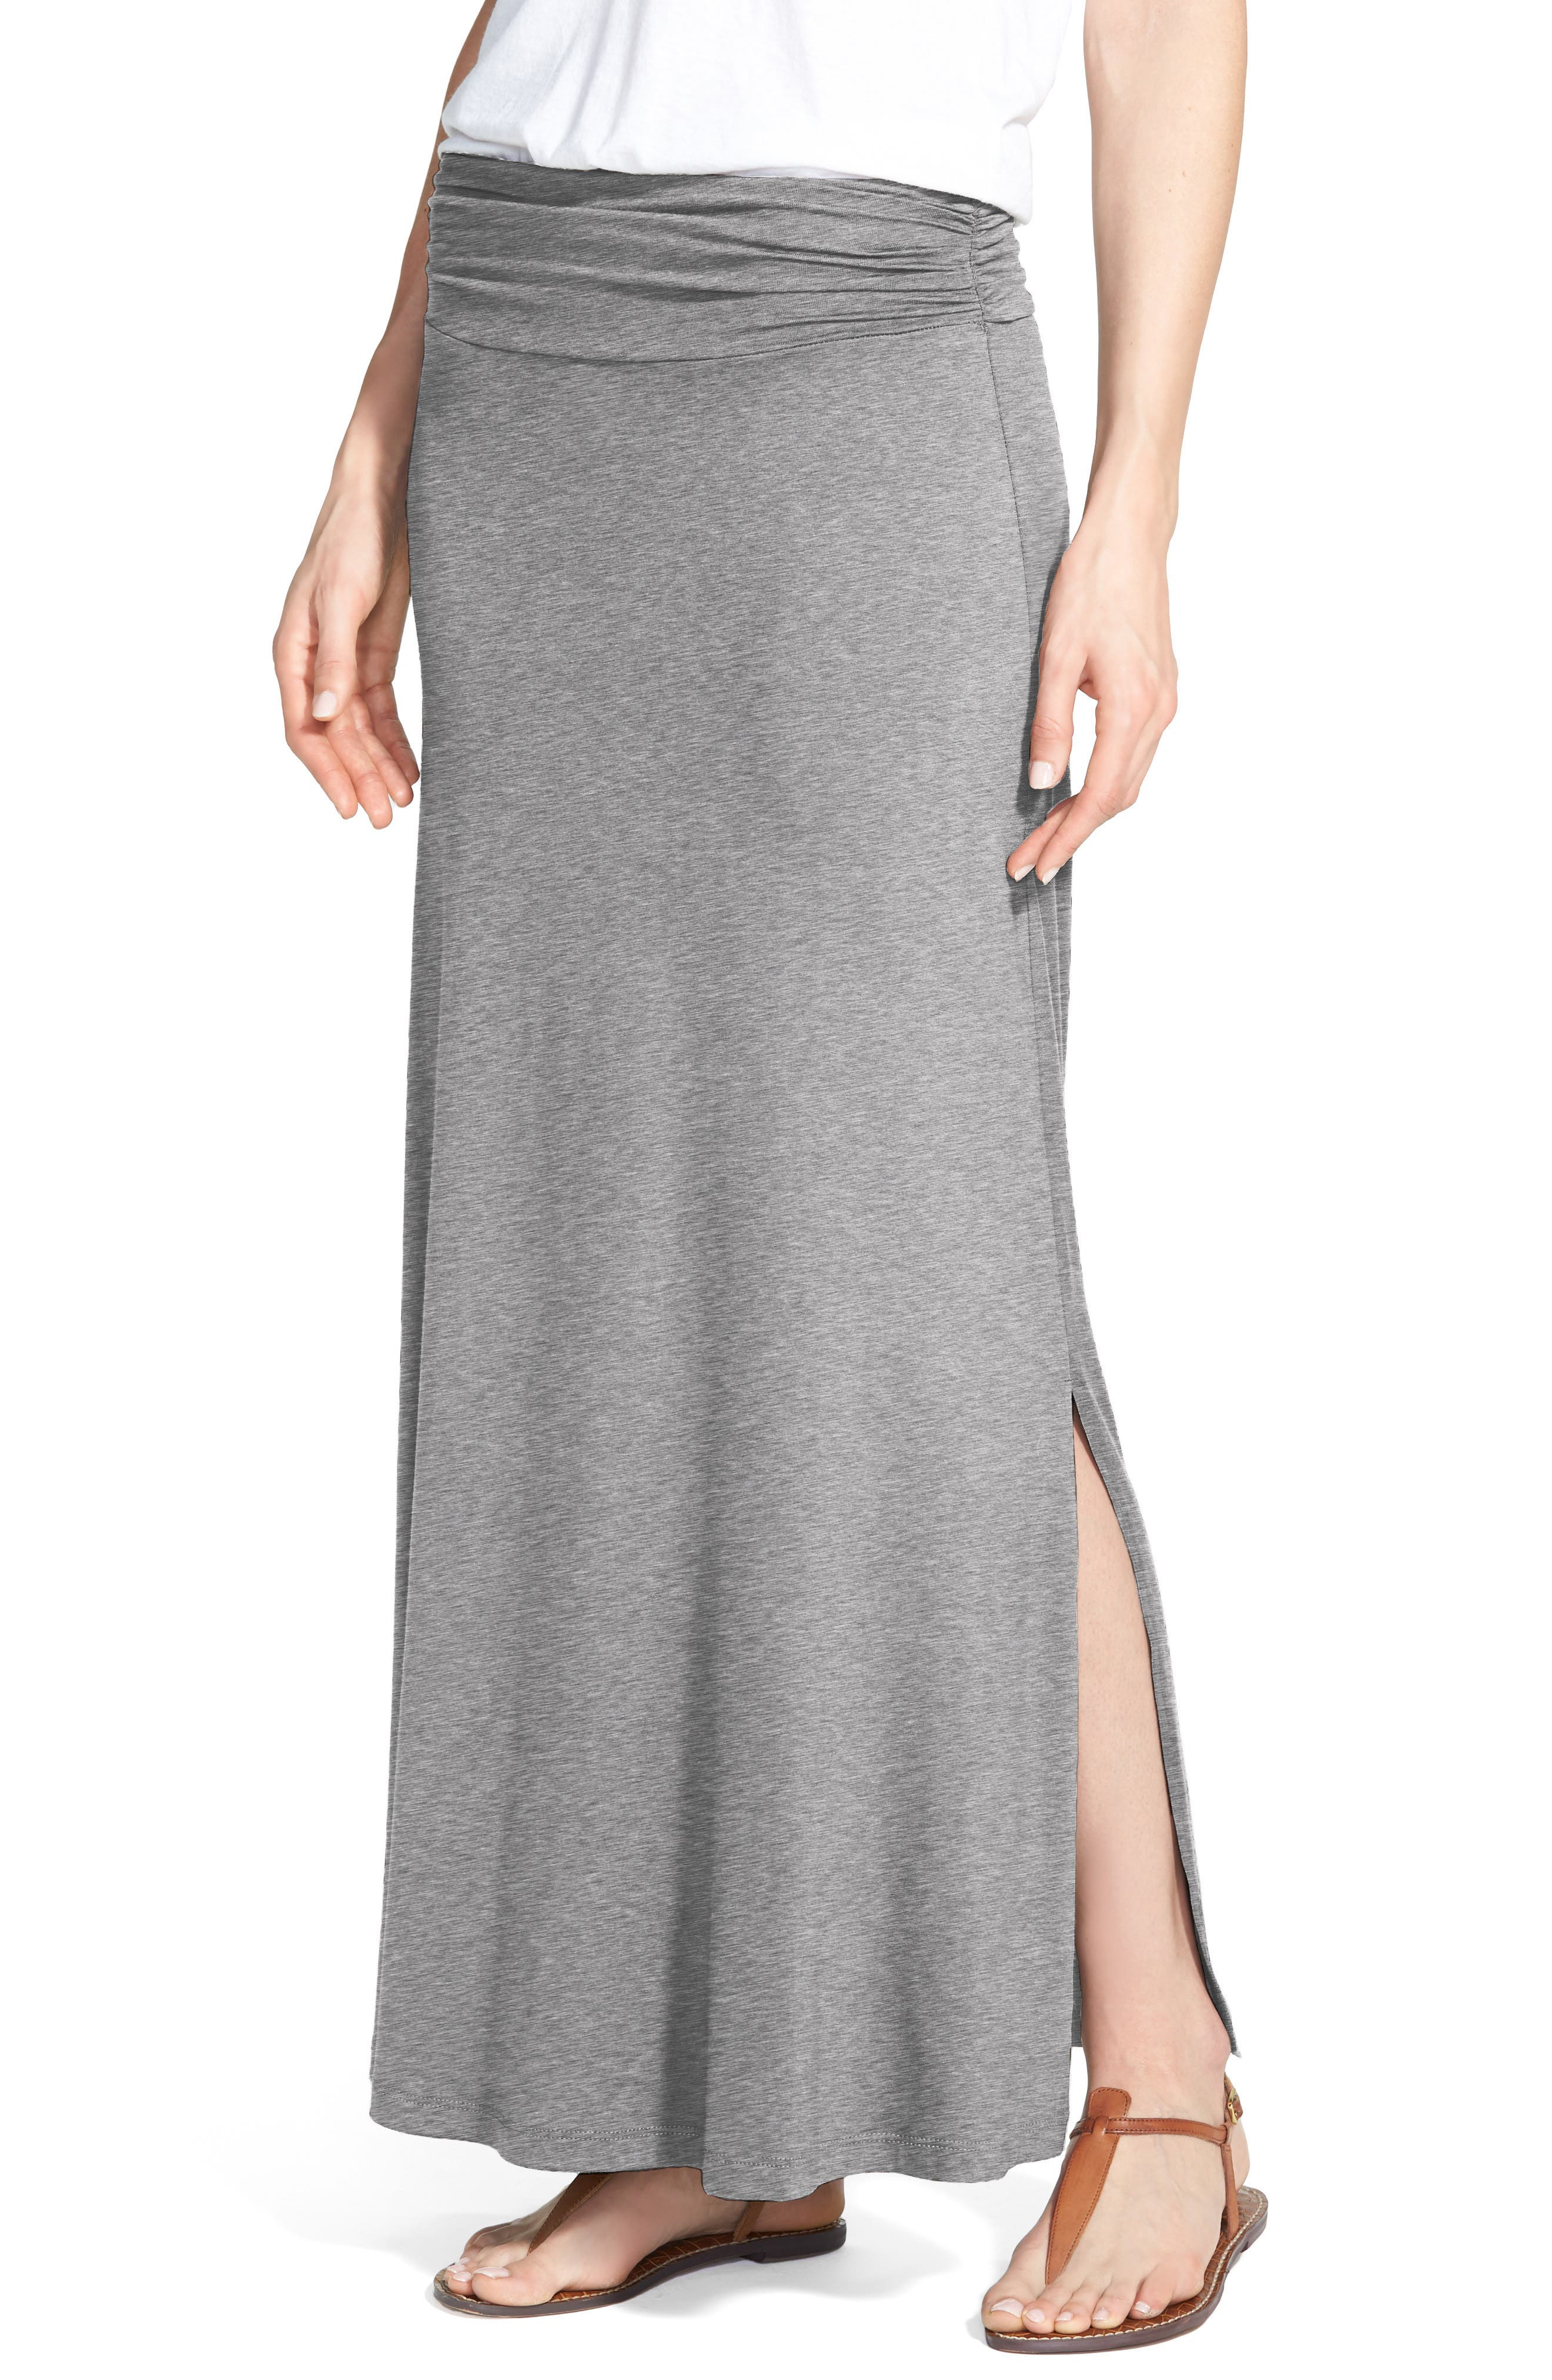 Bobeau Ruched Waist Side Slit Maxi Skirt, Grey